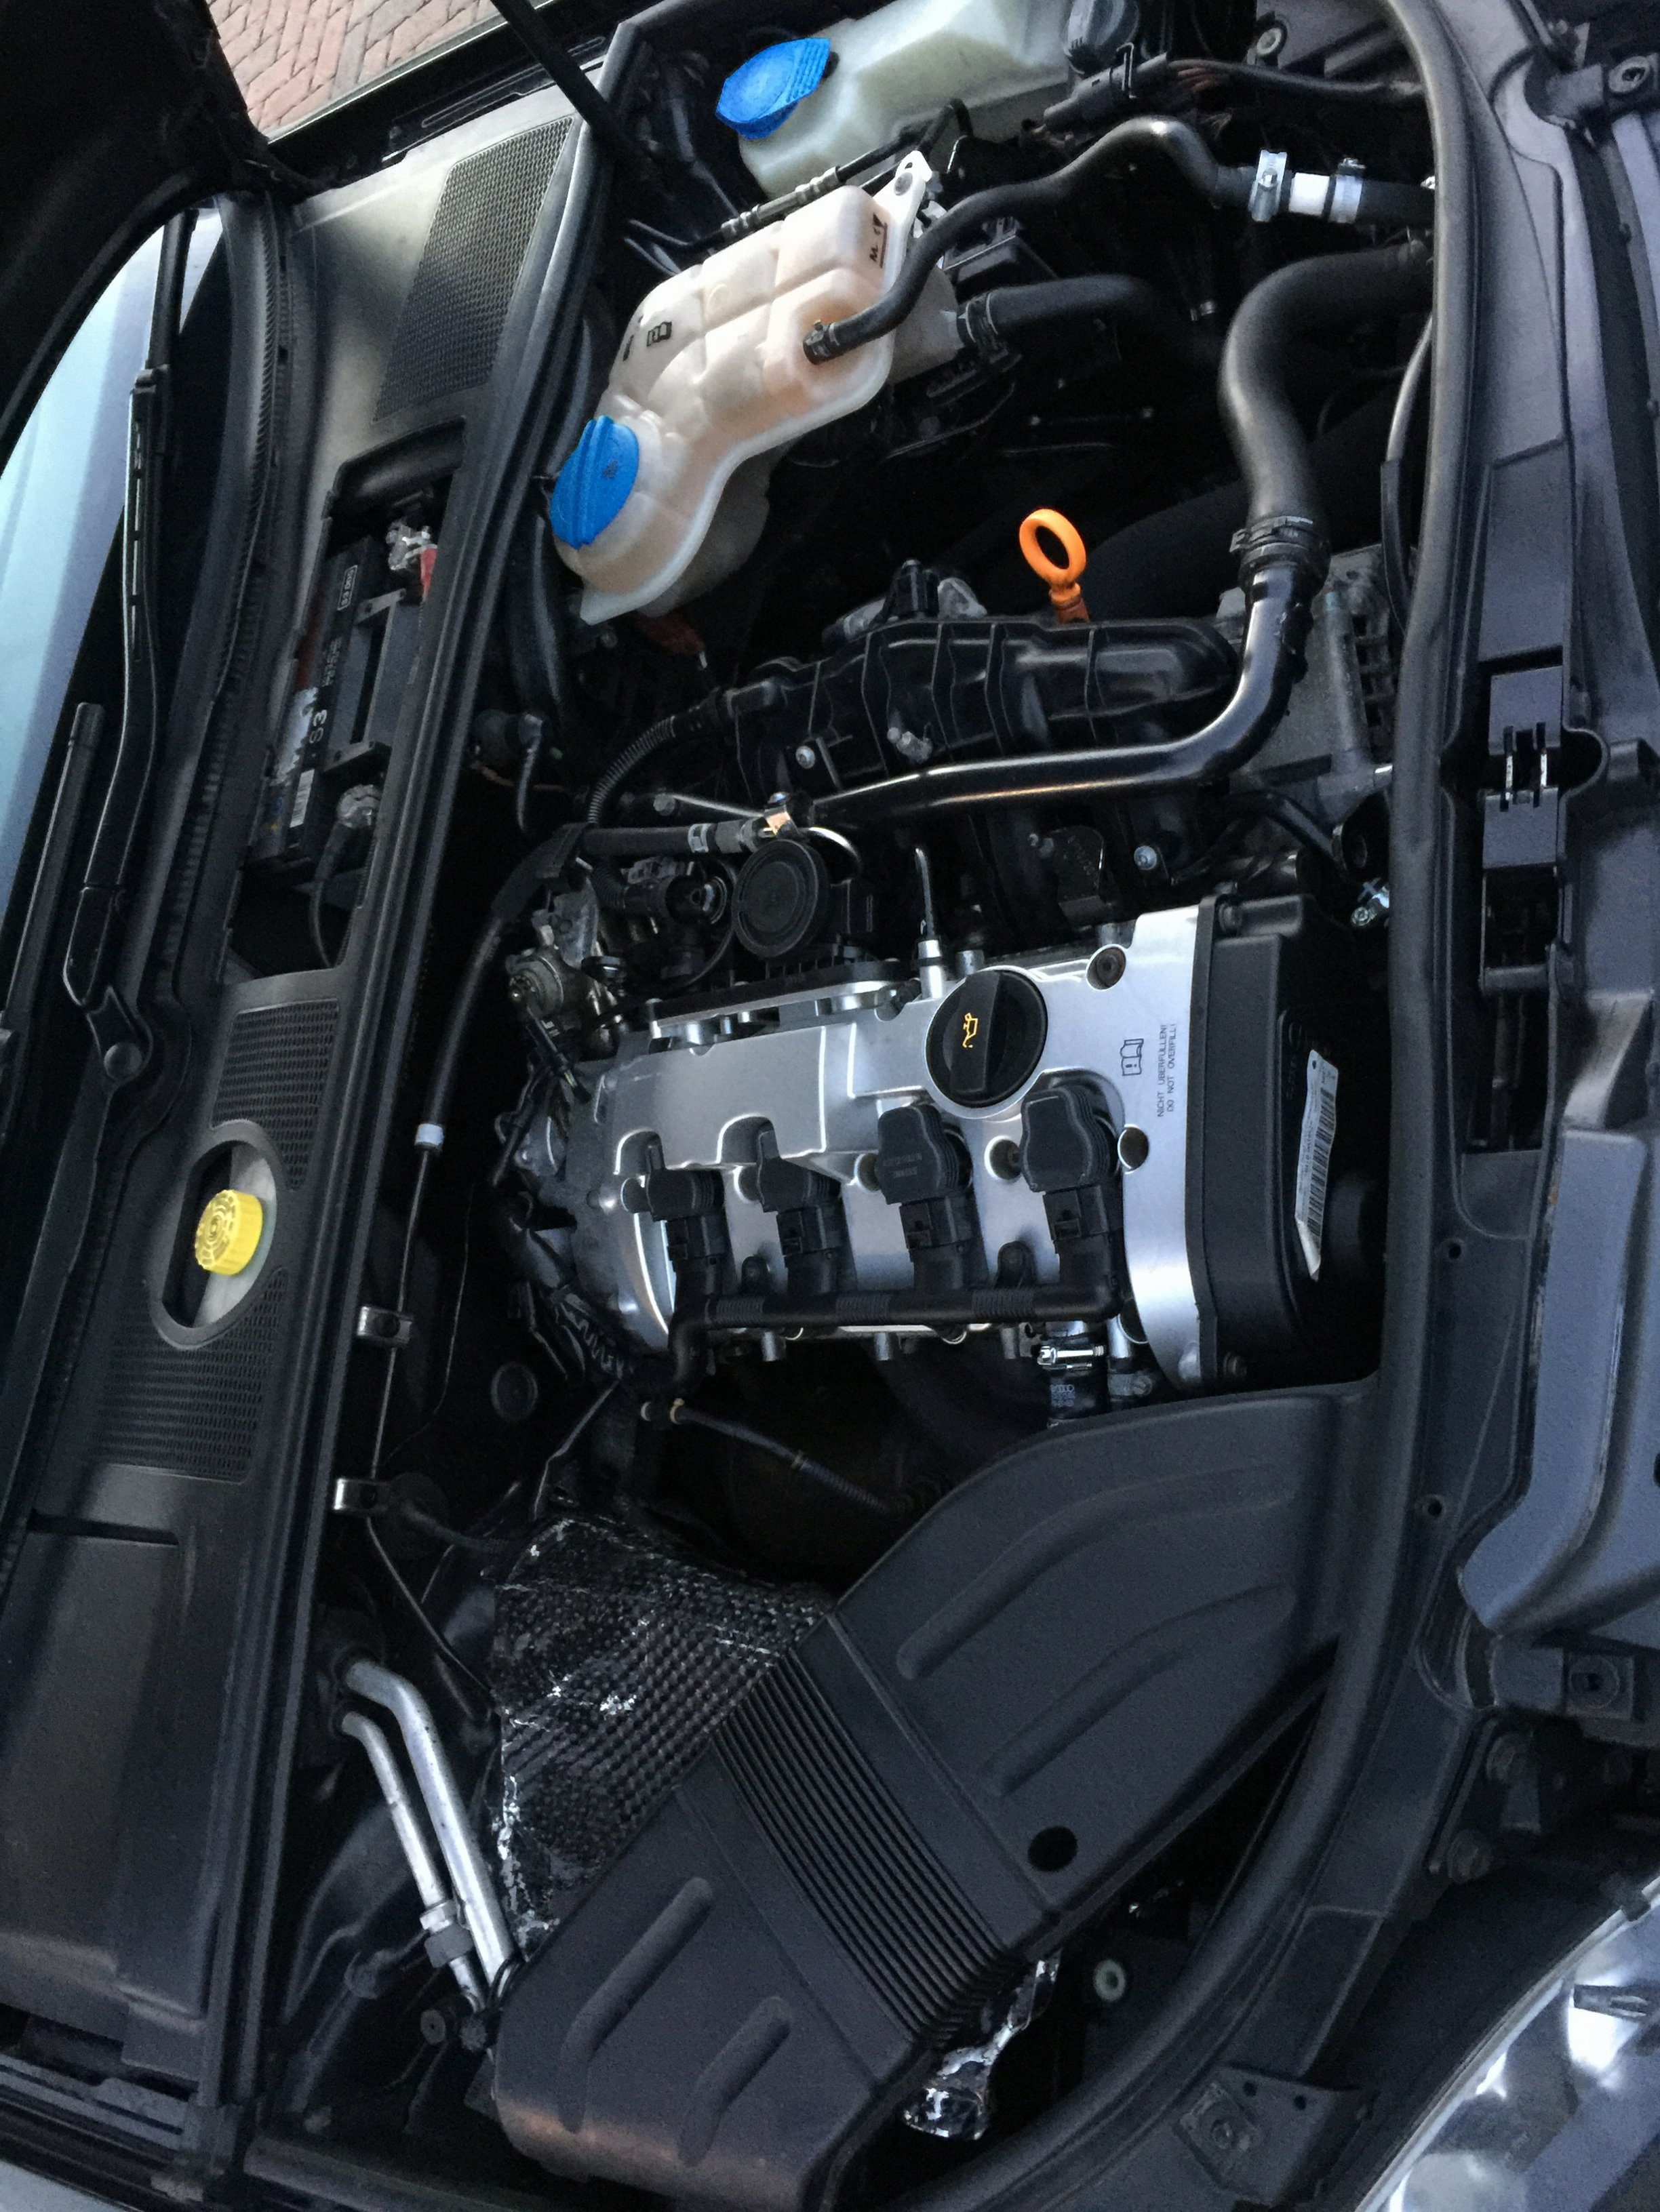 Audi A4 B7 20tfsi Coil Pack Harness Red Conduit Audi Sportnet